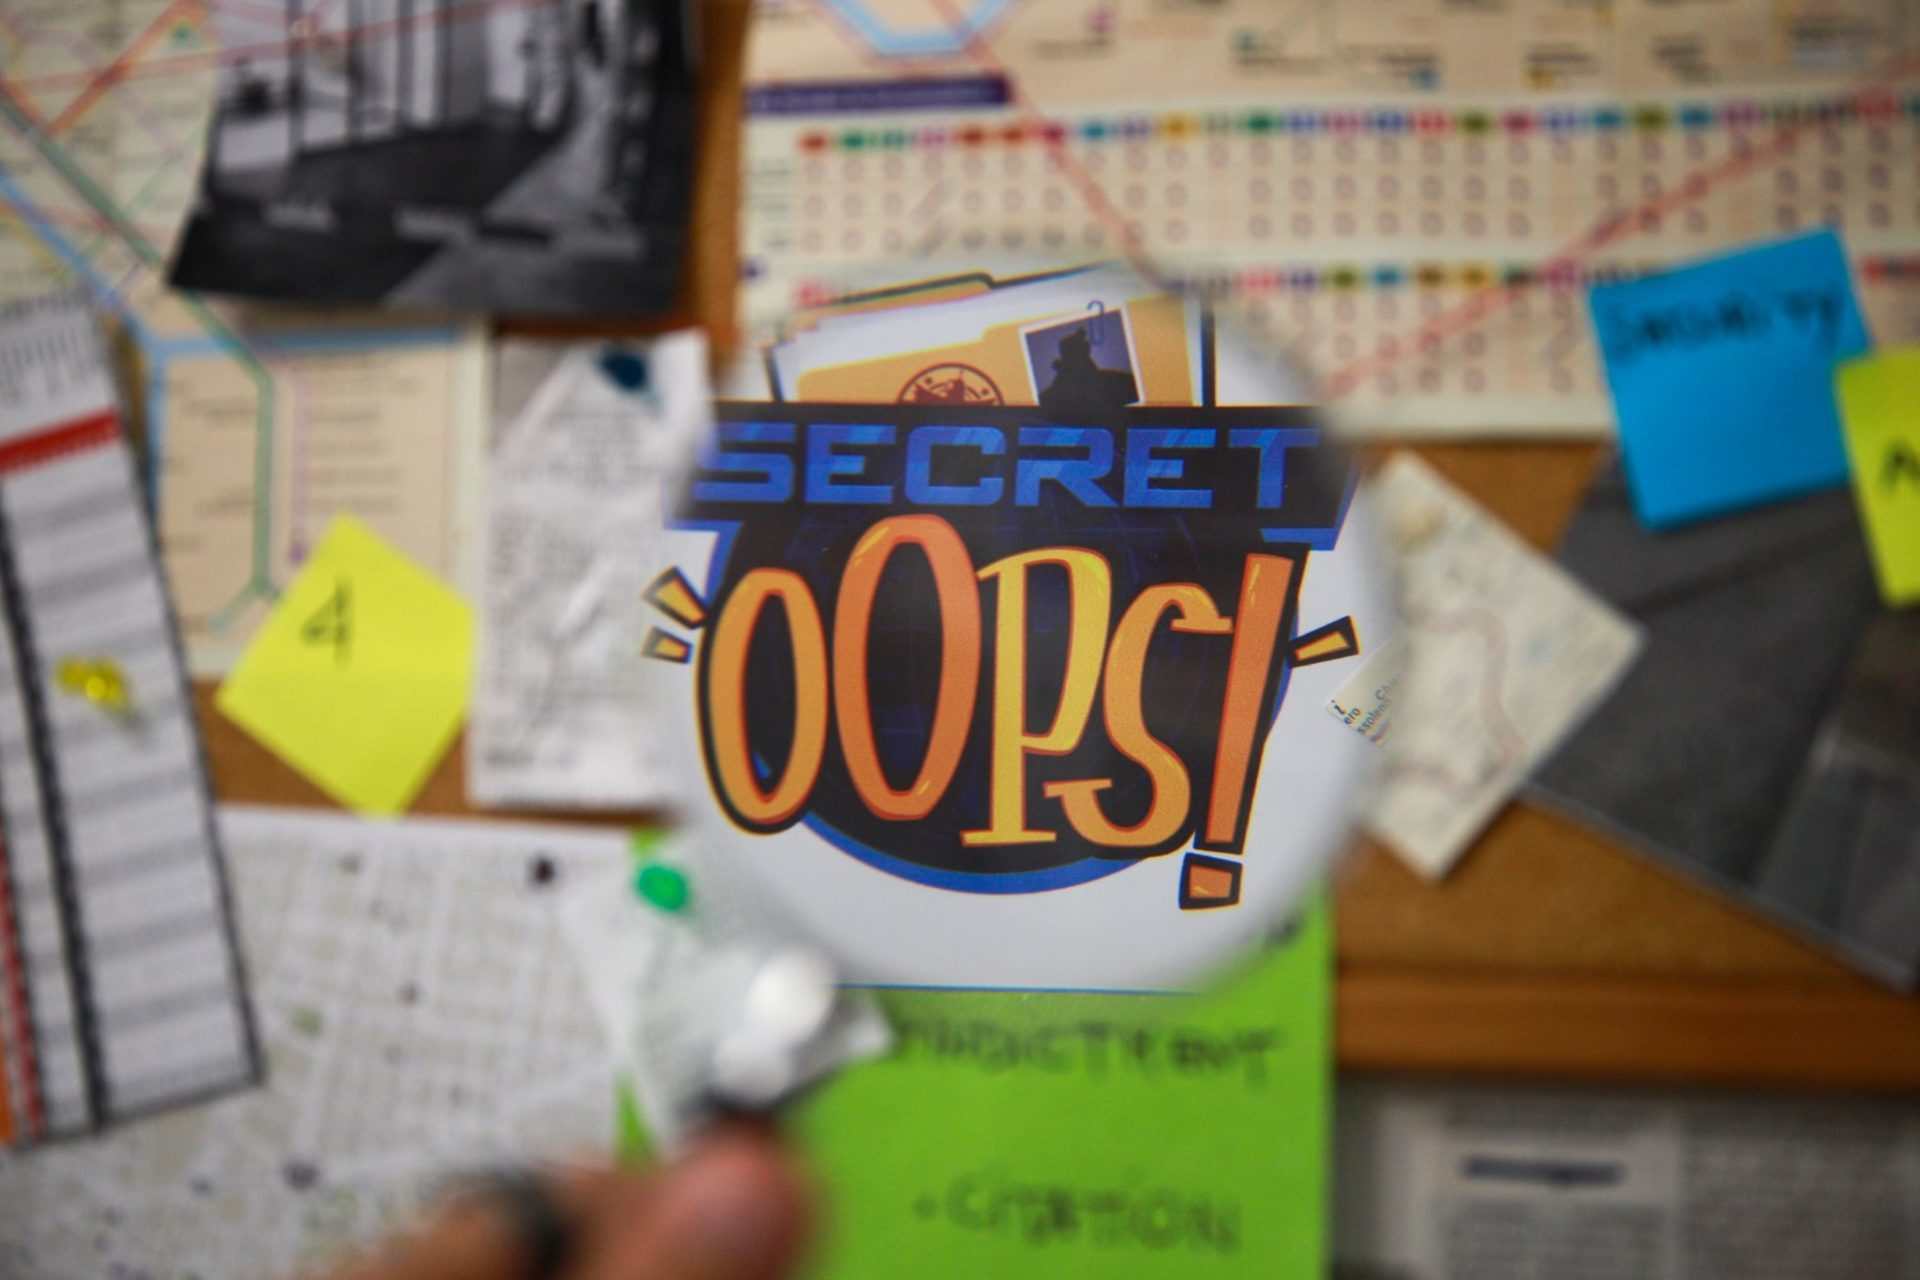 Secret Oops Apple Arcade Video game Trailer video teaser mixedbag